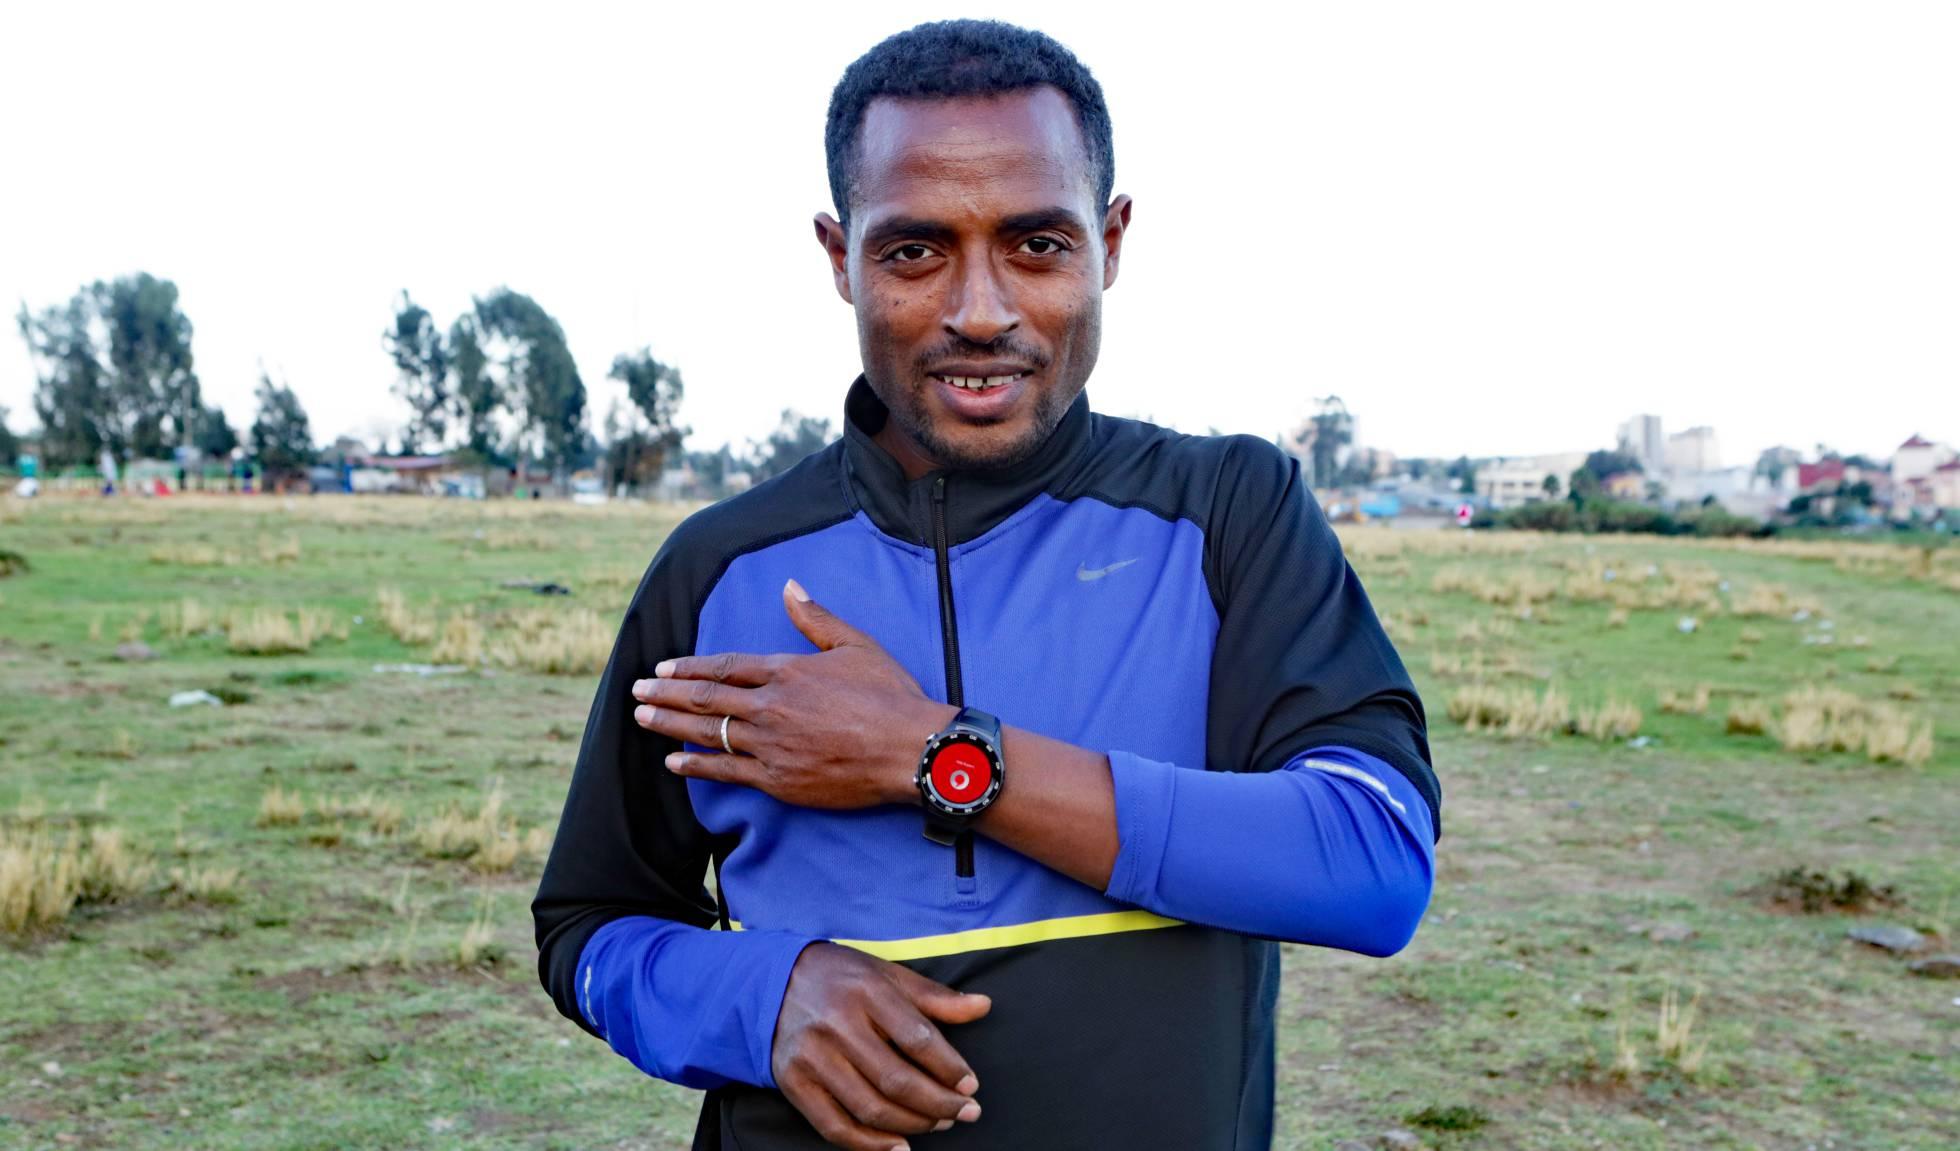 Kenenisa Bekele maraton Londres 2017 London marathon récord Locos Por Correr 01